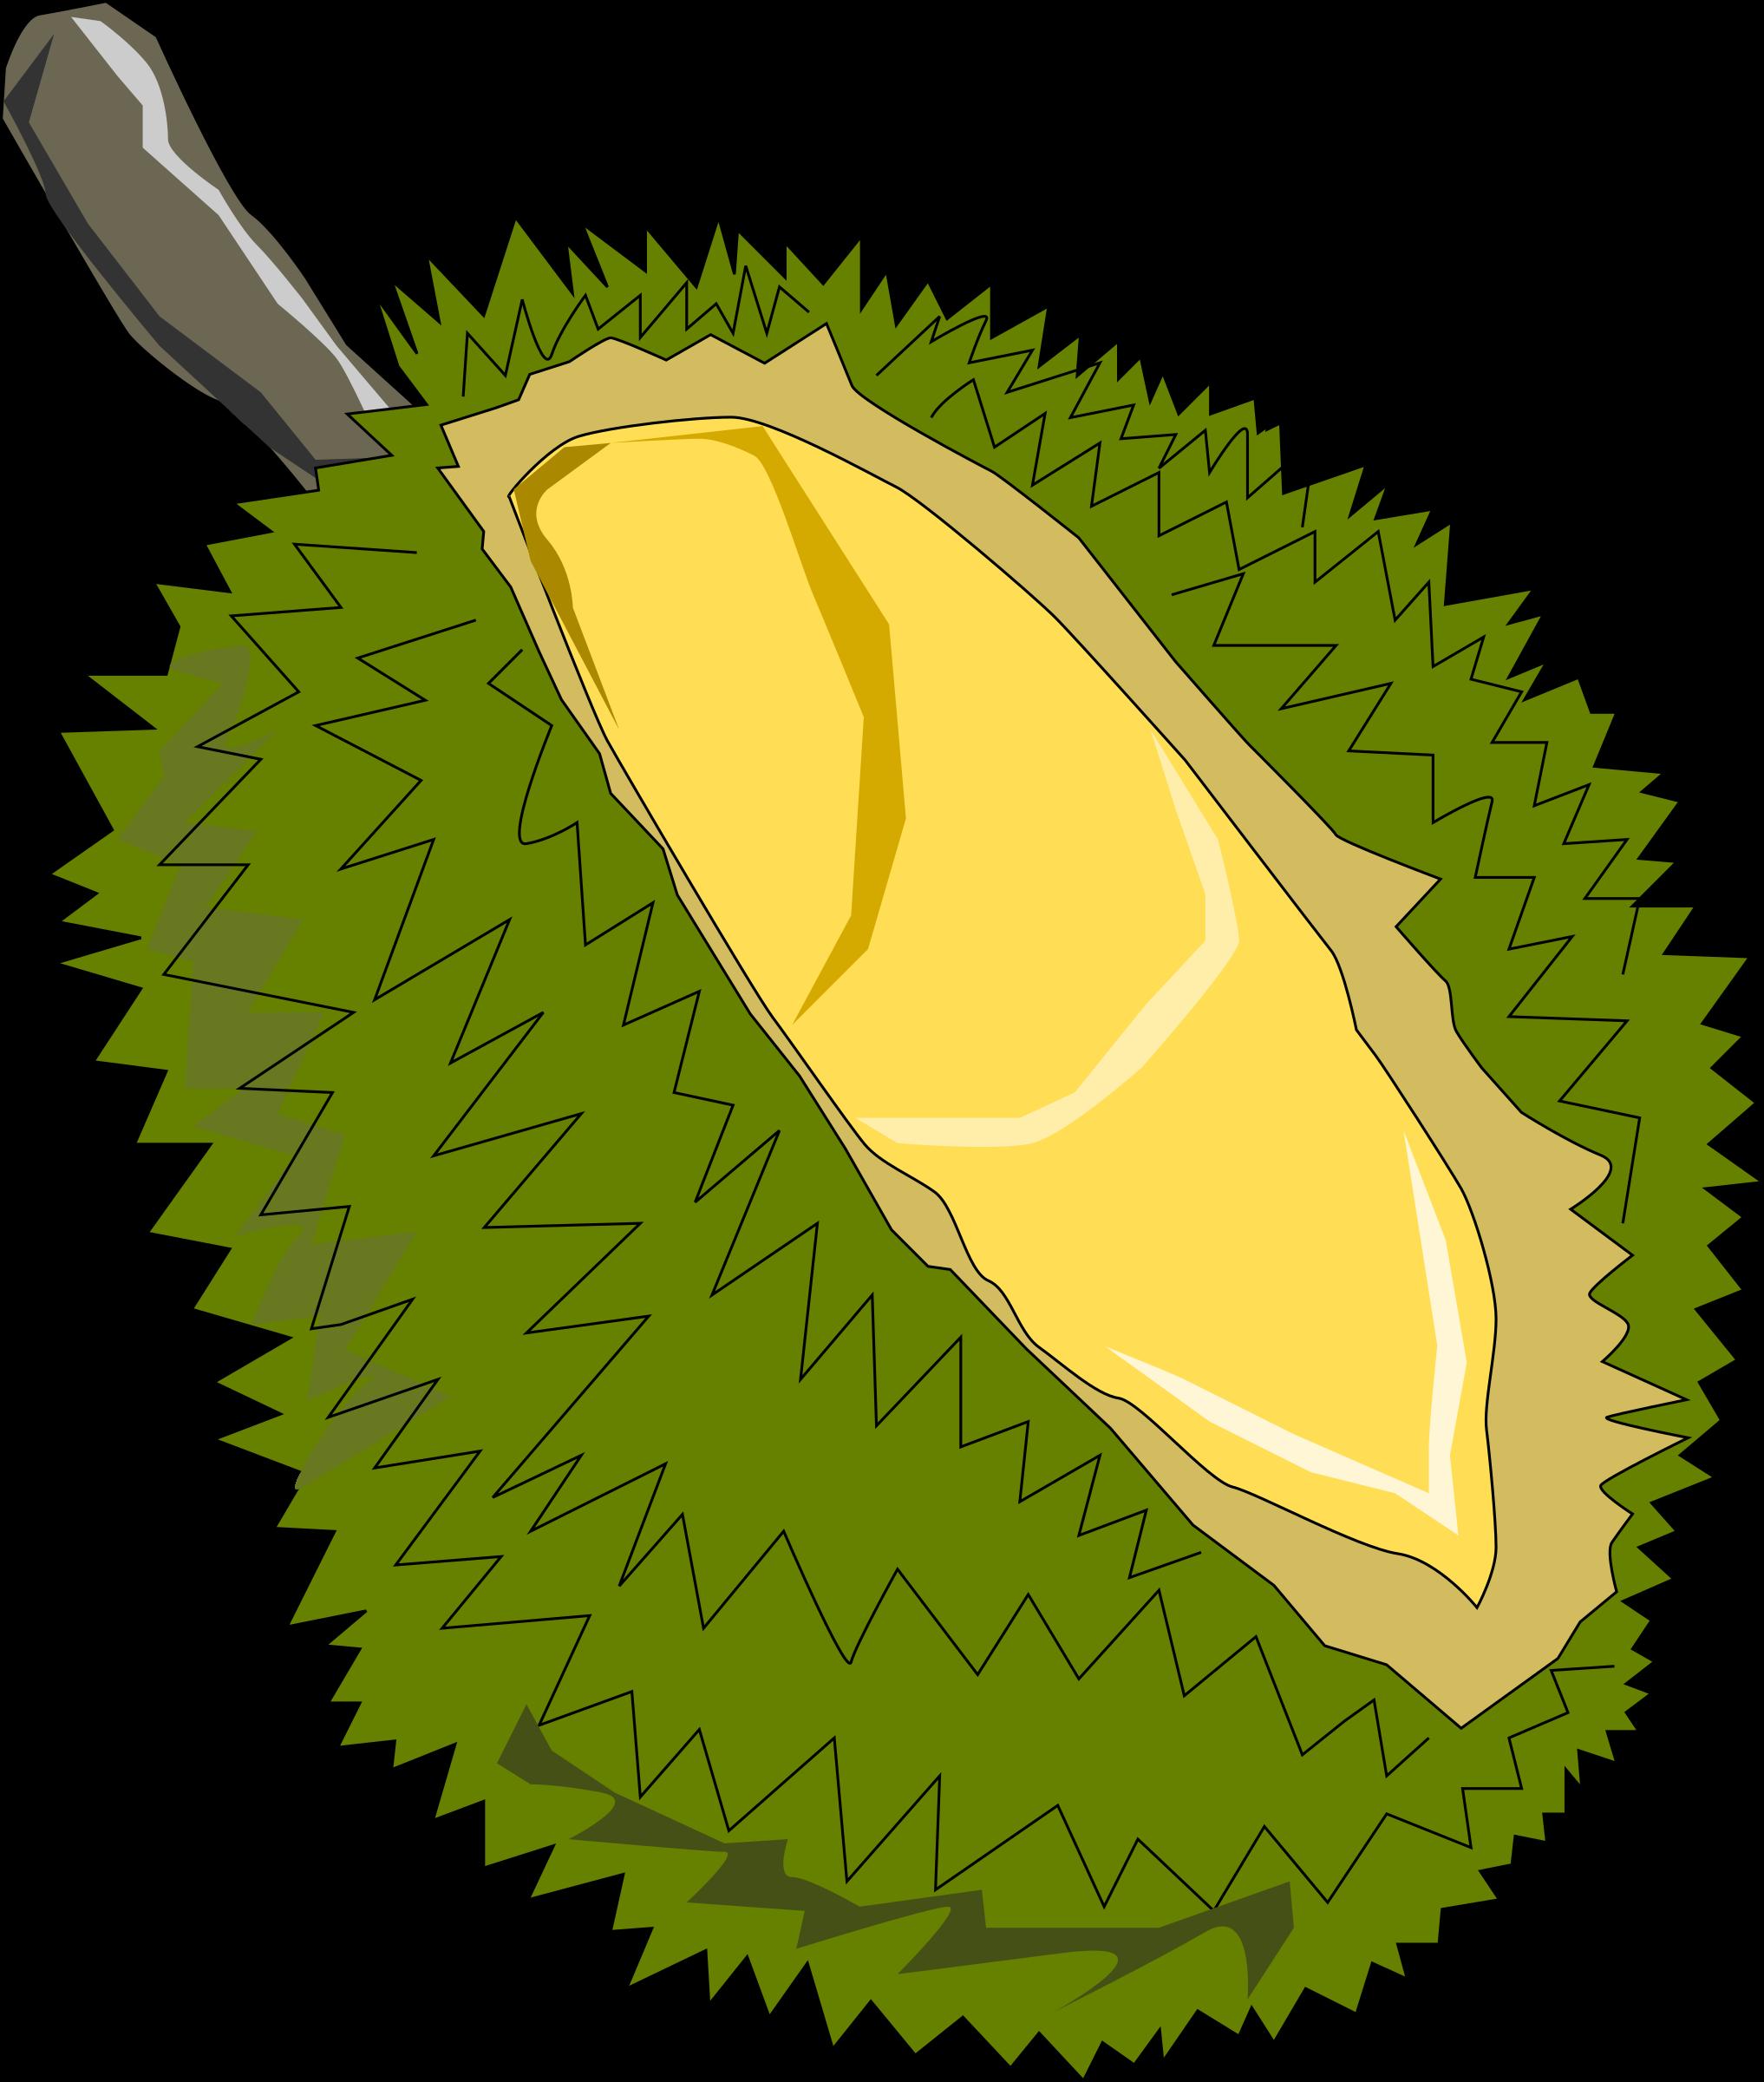 Durian Drawing at GetDrawings